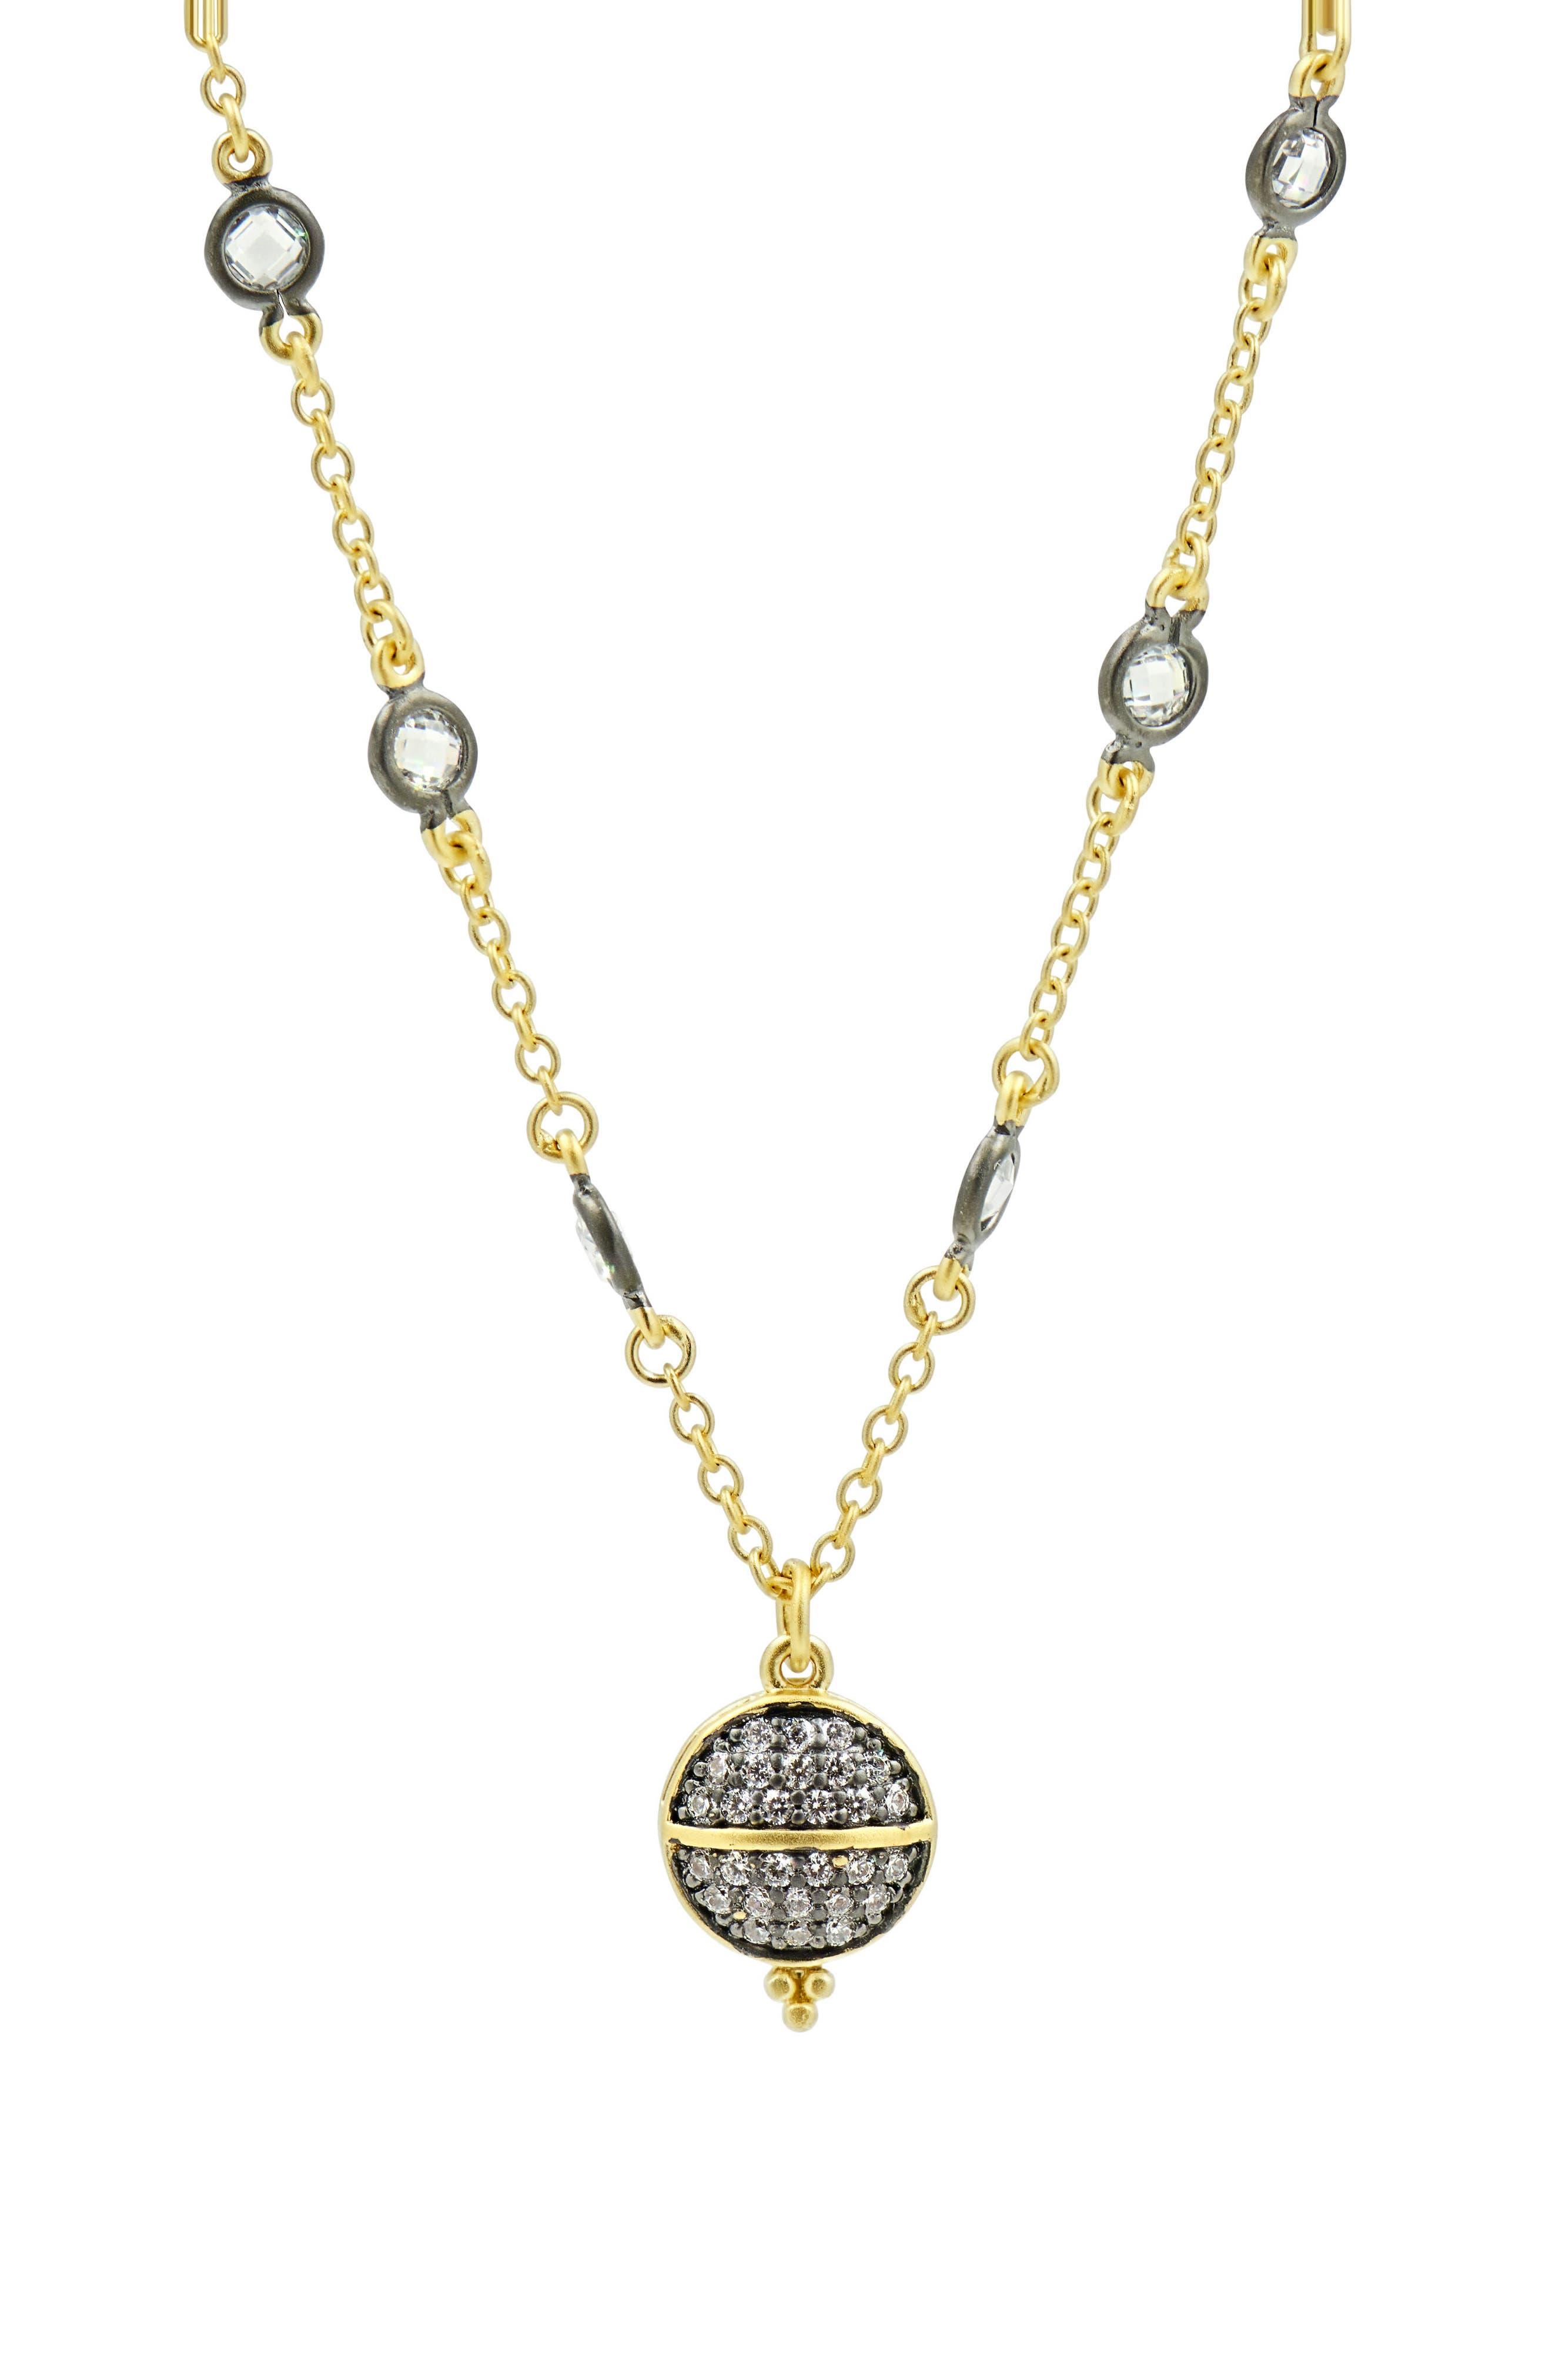 FREIDA ROTHMAN Textured Ornaments Choker Necklace